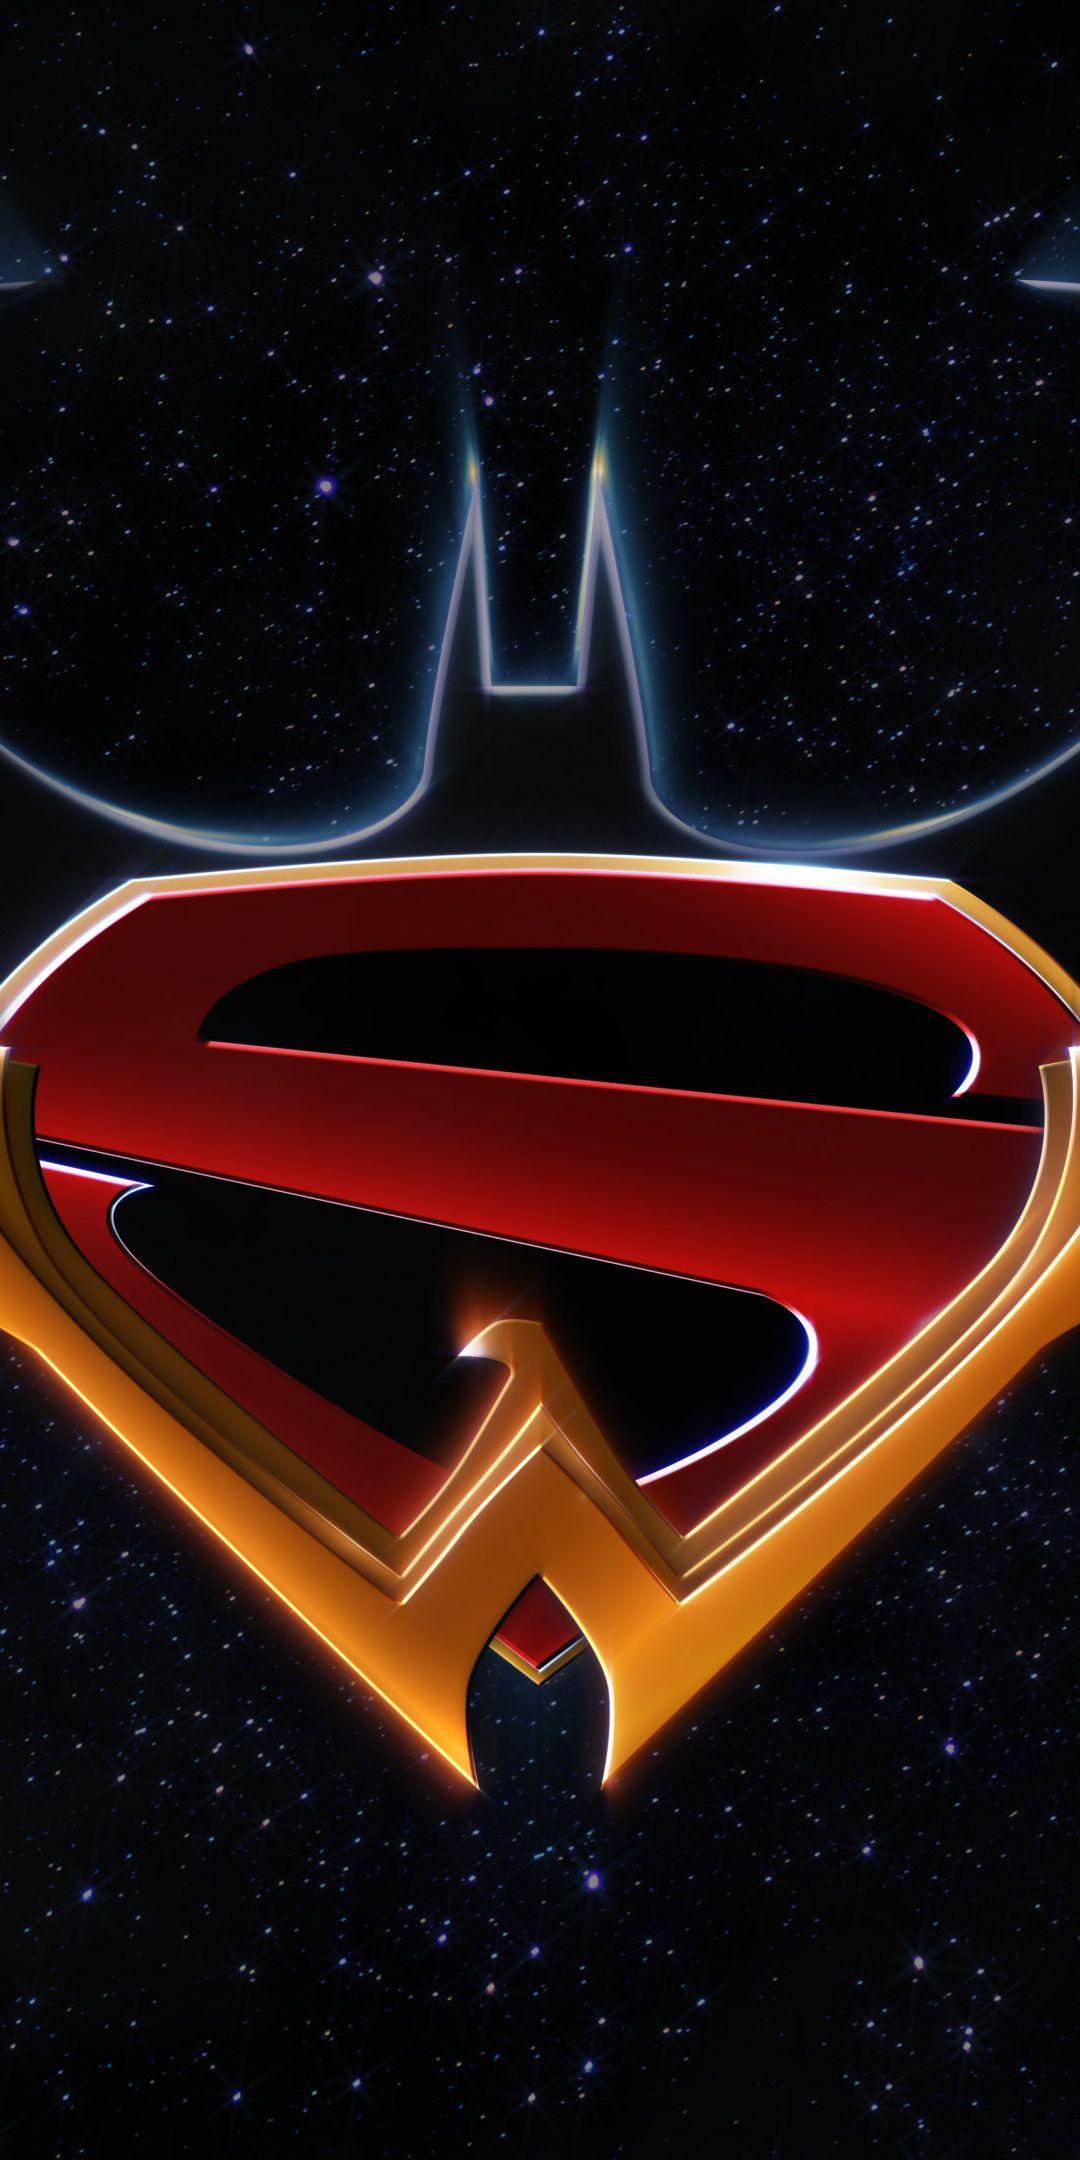 Logo, dark, Batman, Superman, Wonder Woman DC comics